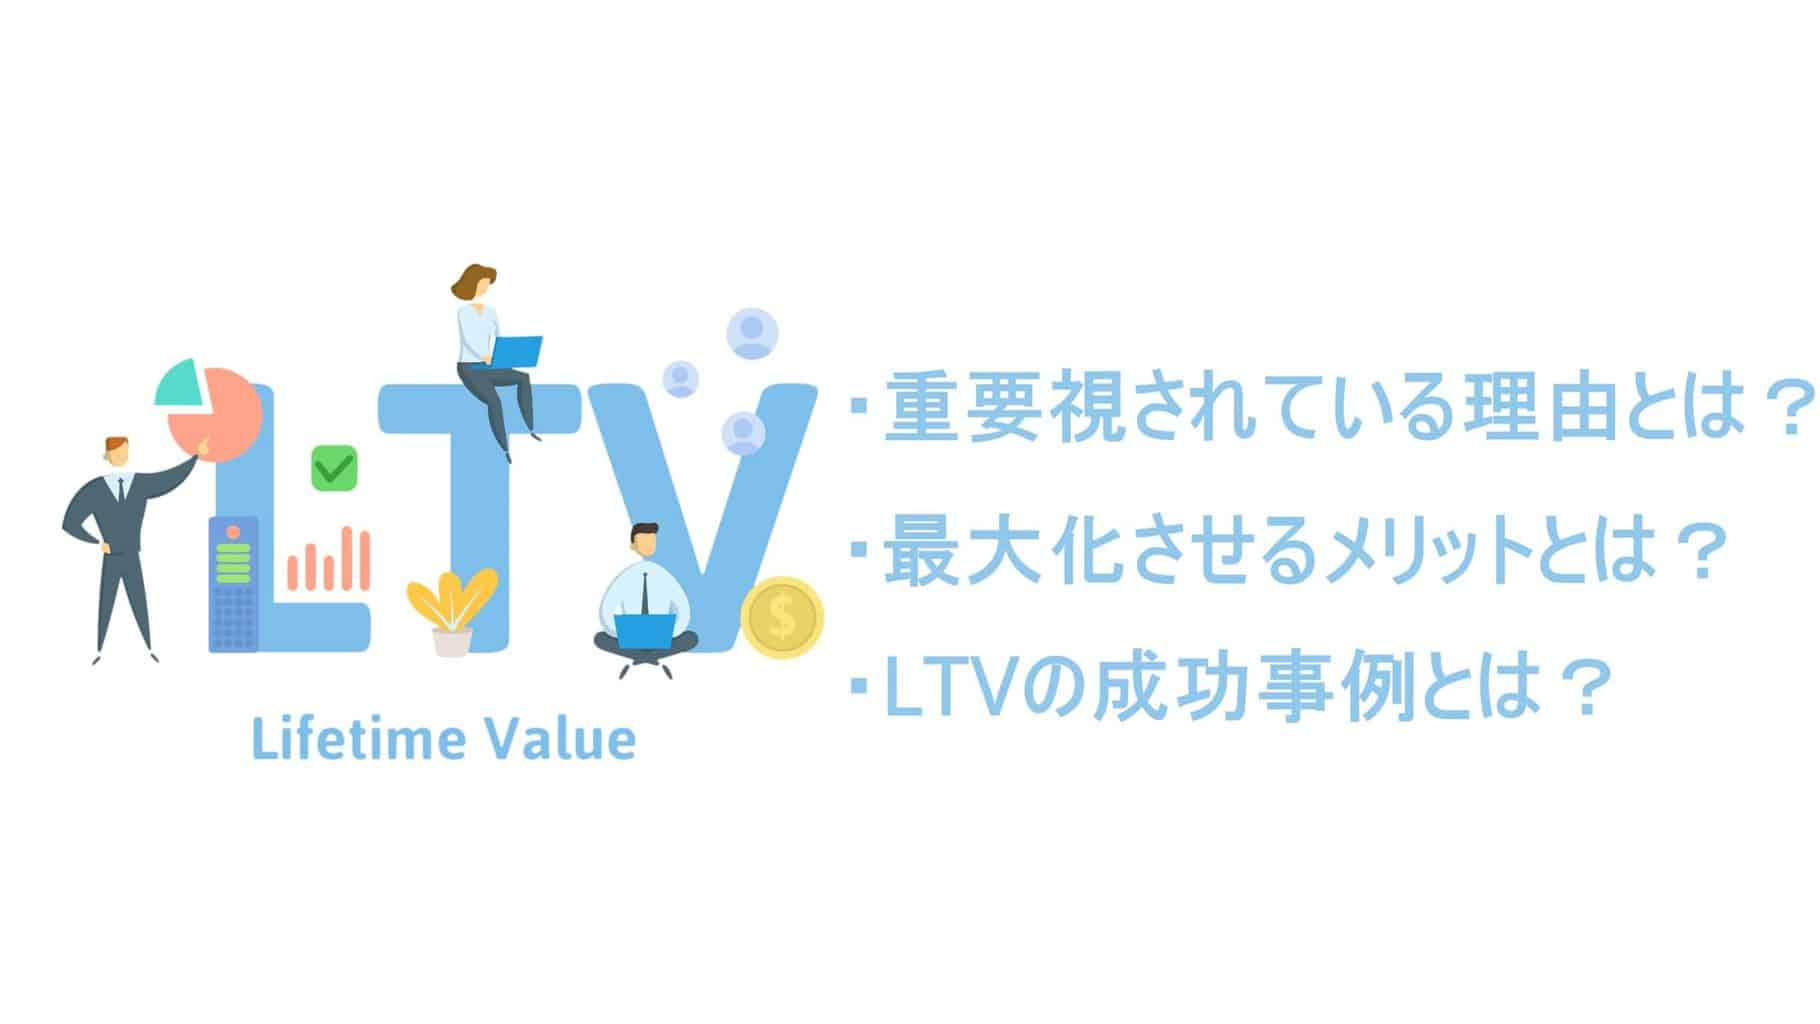 LTVの成功事例とは?LTVが重要視されている理由や最大化させるメリットも紹介!